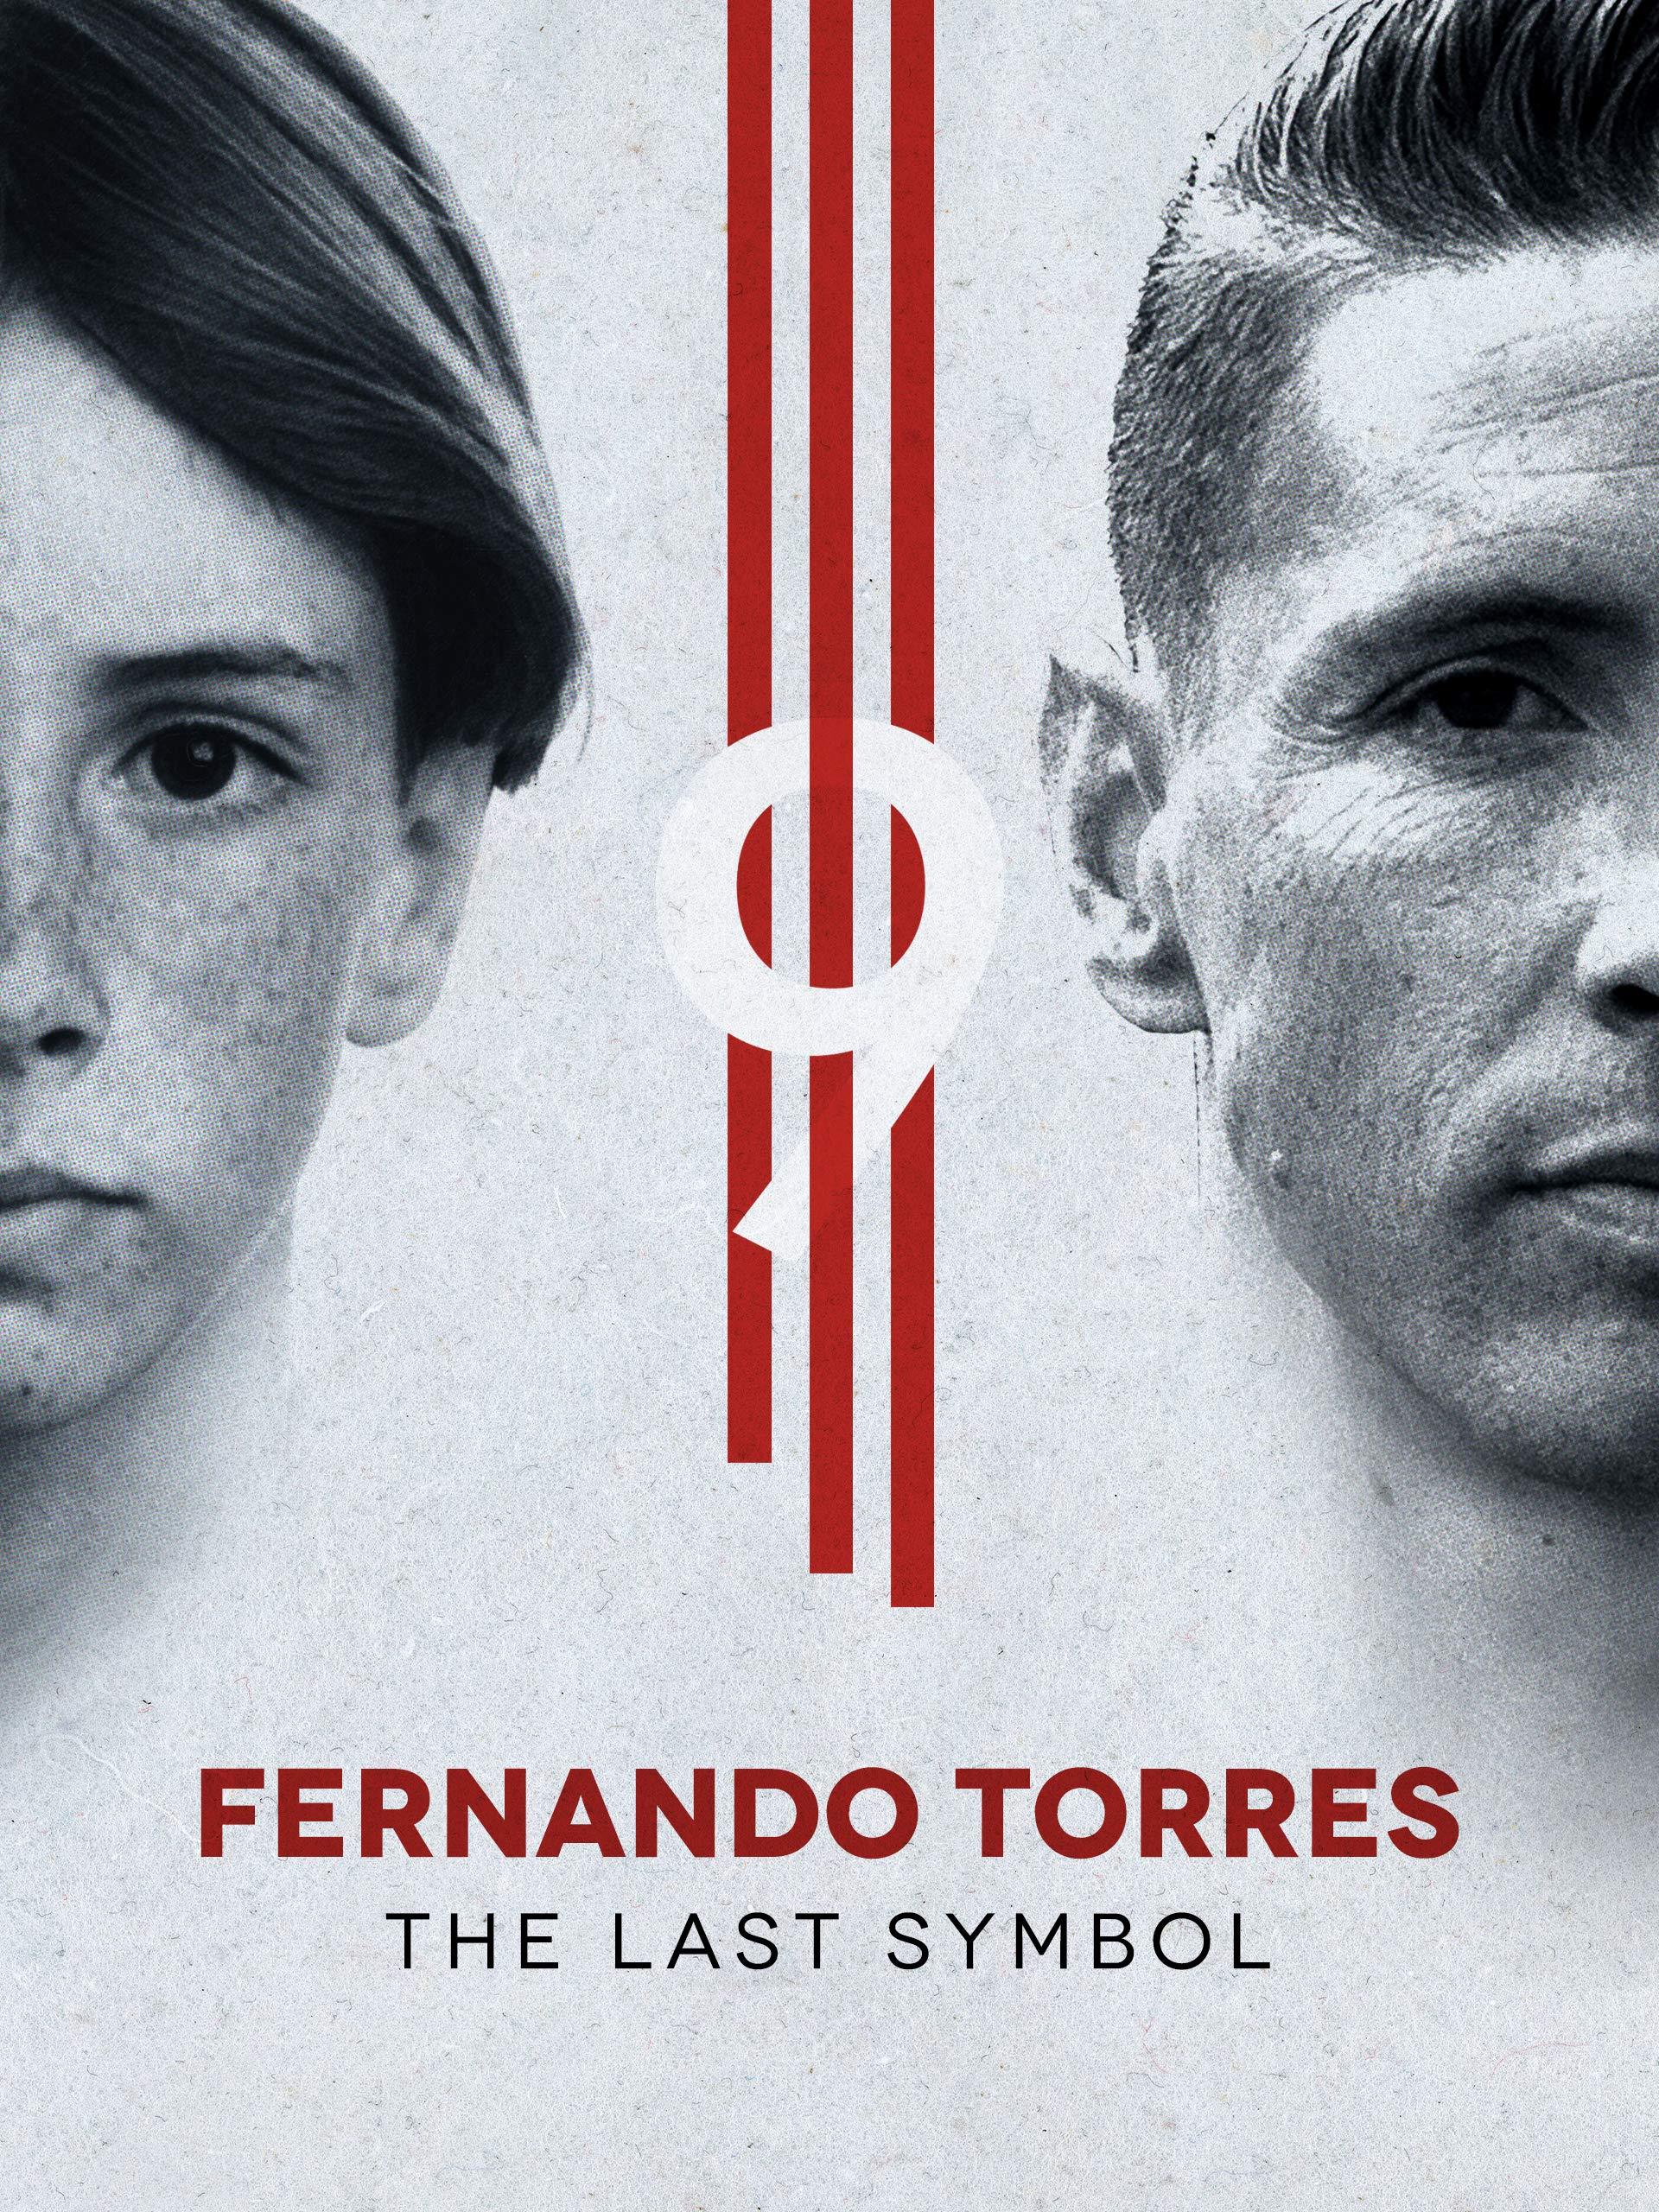 Fernando Torres: The Last Symbol on Amazon Prime Video UK